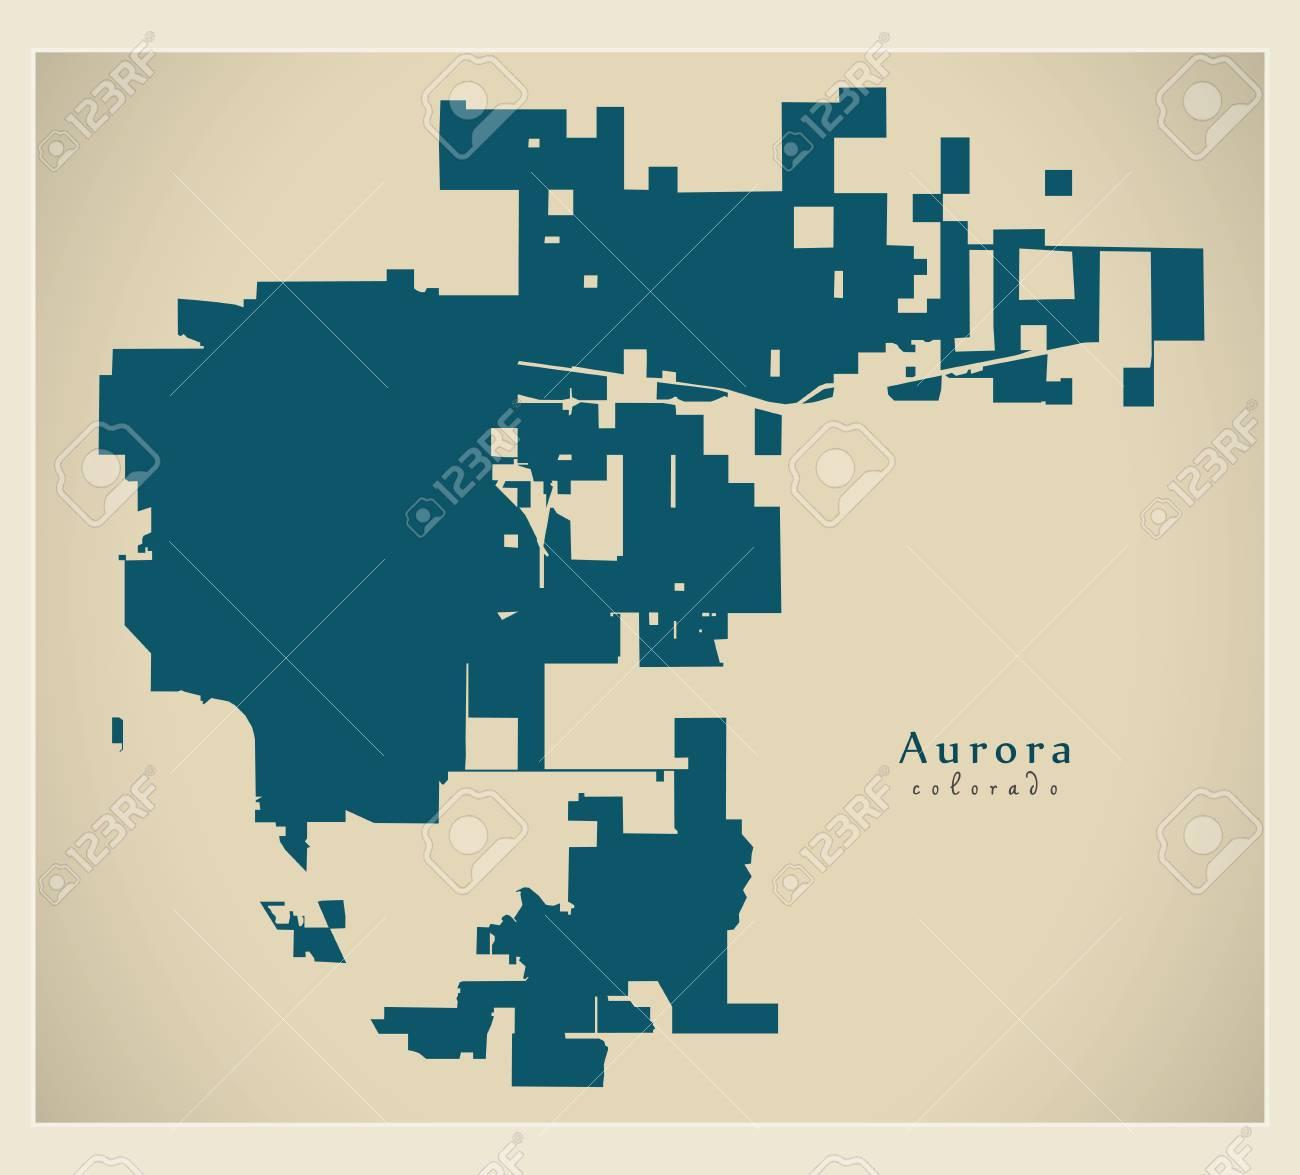 Modern City Map - Aurora Colorado City Of The USA Royalty Free ... on